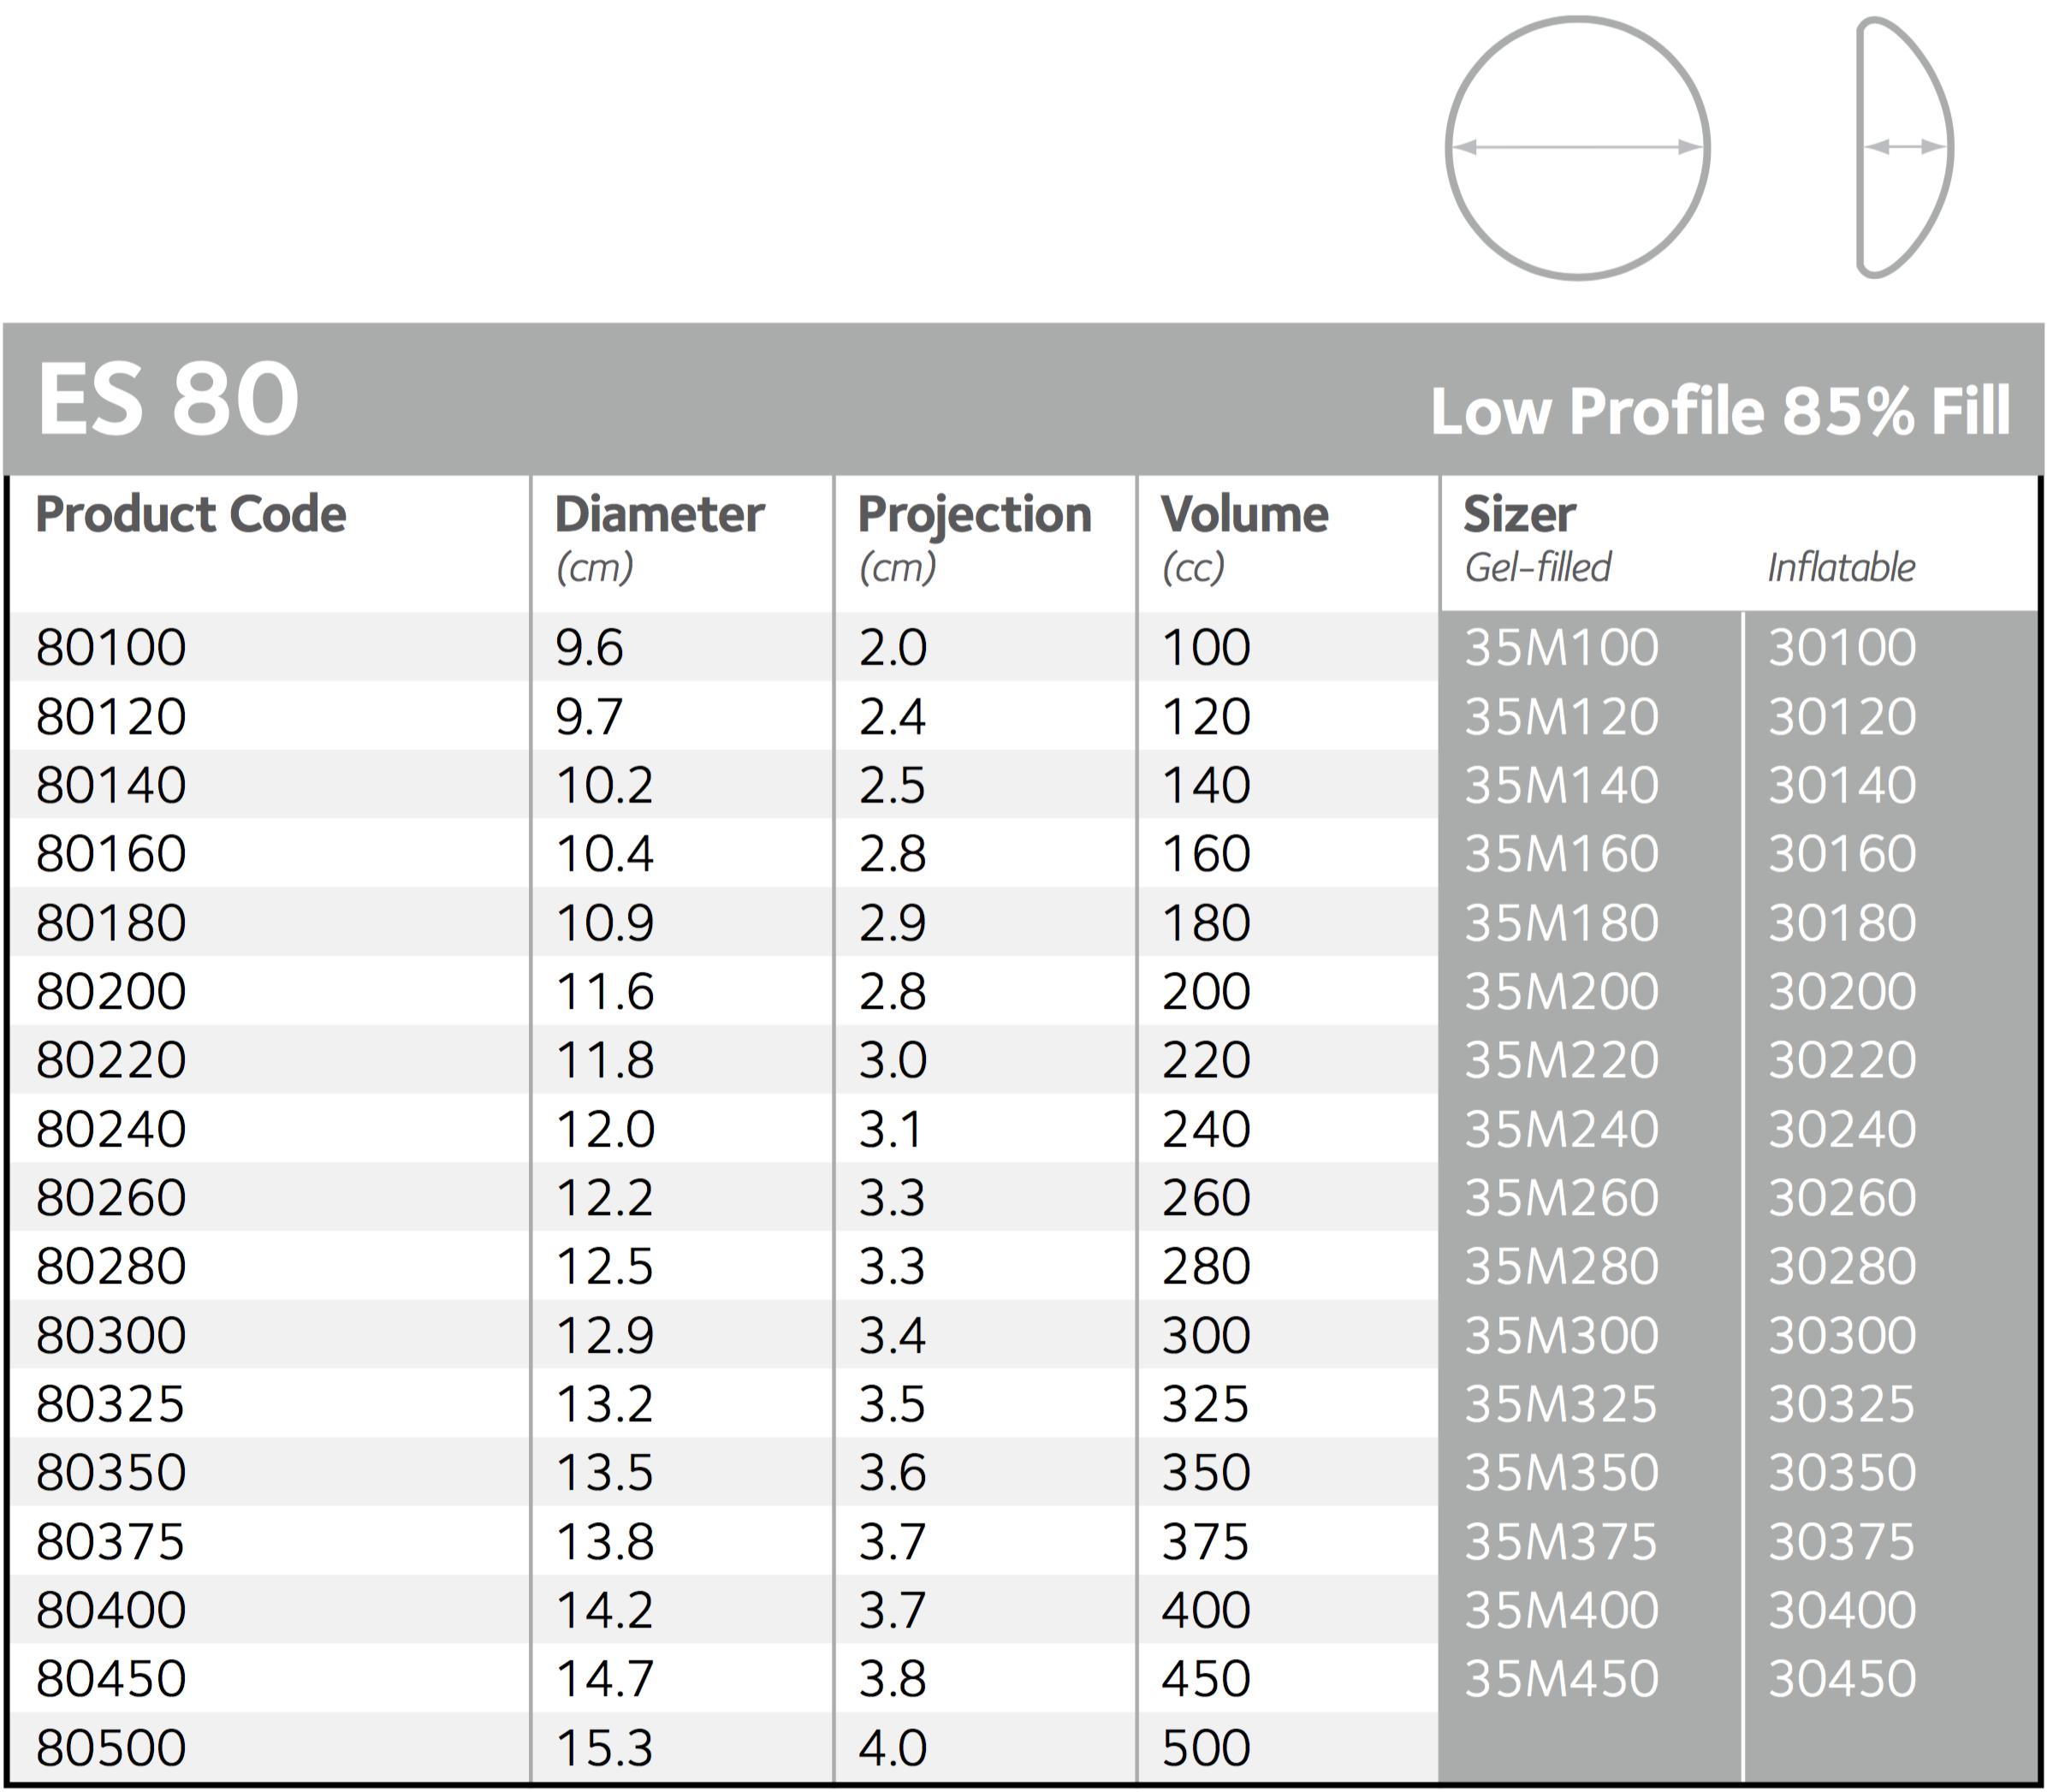 EuroSilicone ES 80 Low Profile